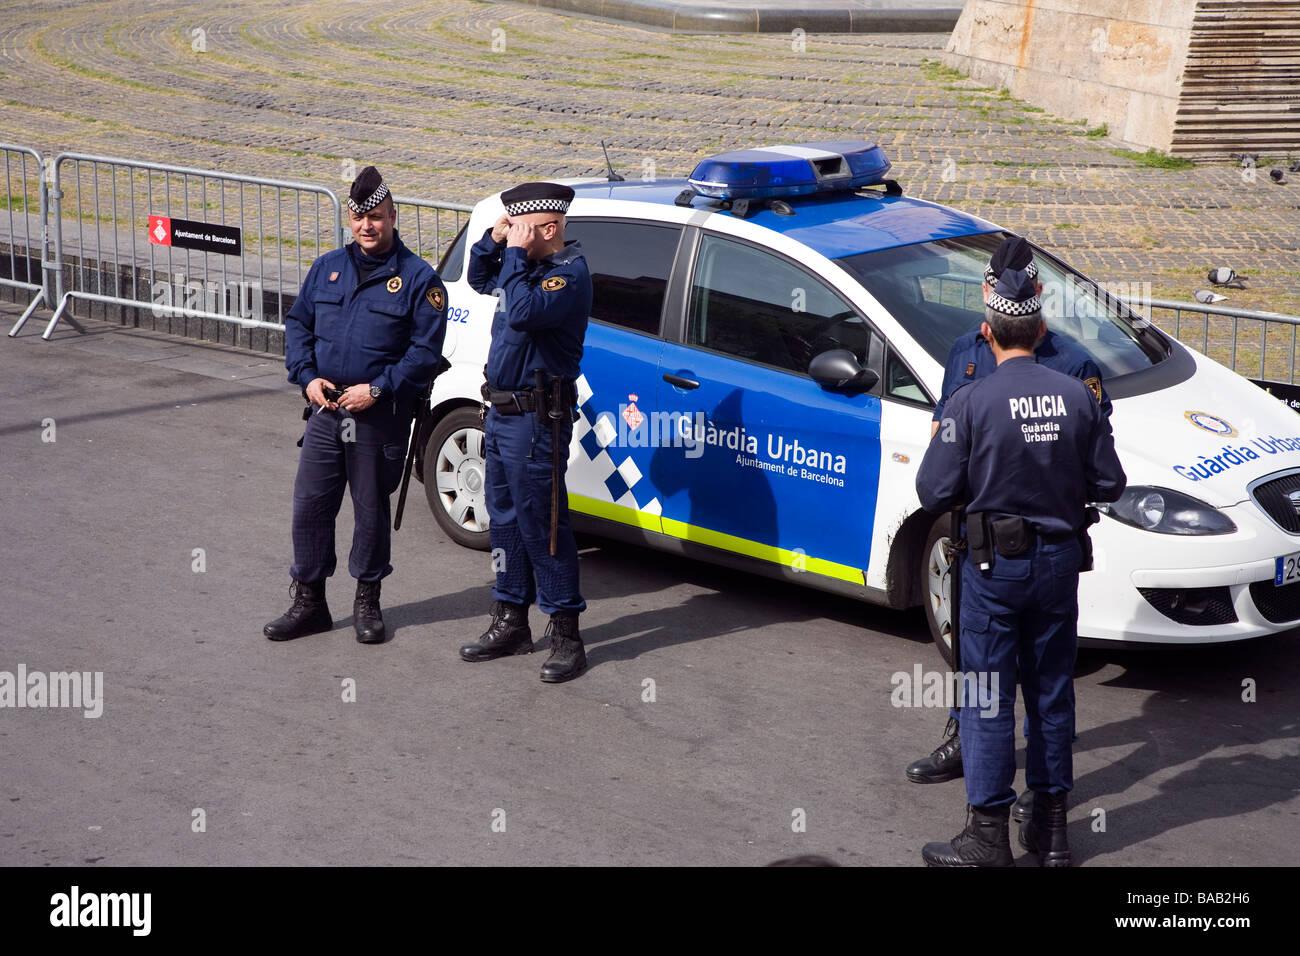 Urban Police Guardia Urbana Barcelona Catalunya Spain - Stock Image